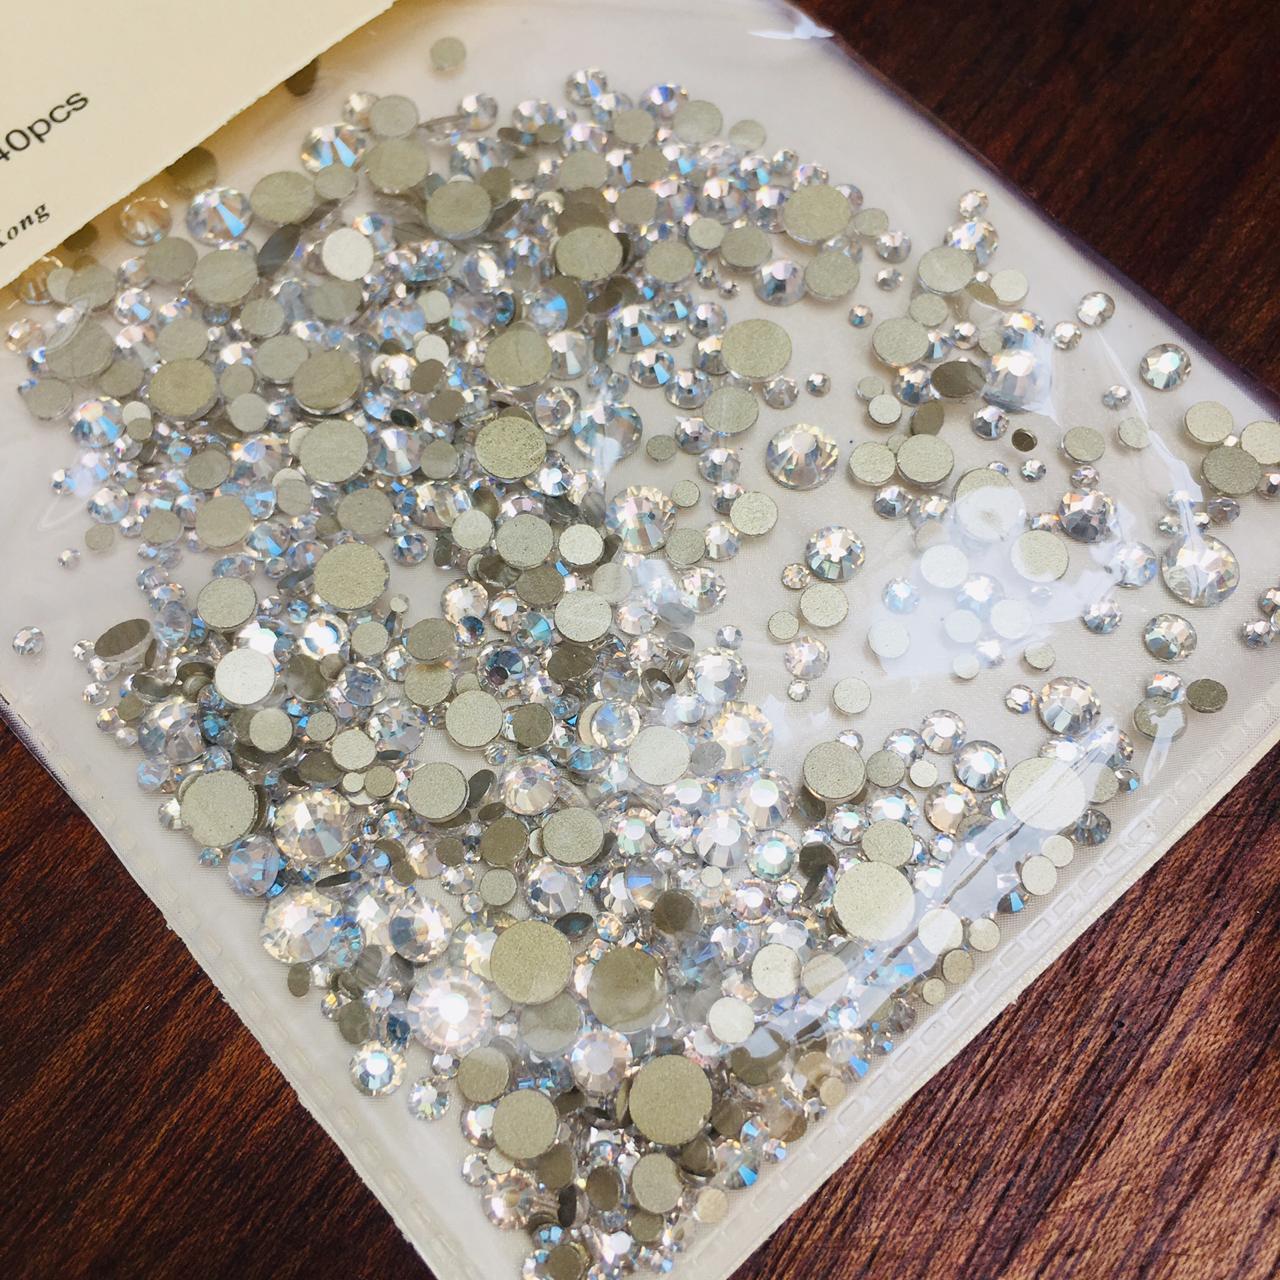 Cristal similar ao swarovski MIX 1400 pecas (pedraria)  - Sílvia Pedrarias & Cia